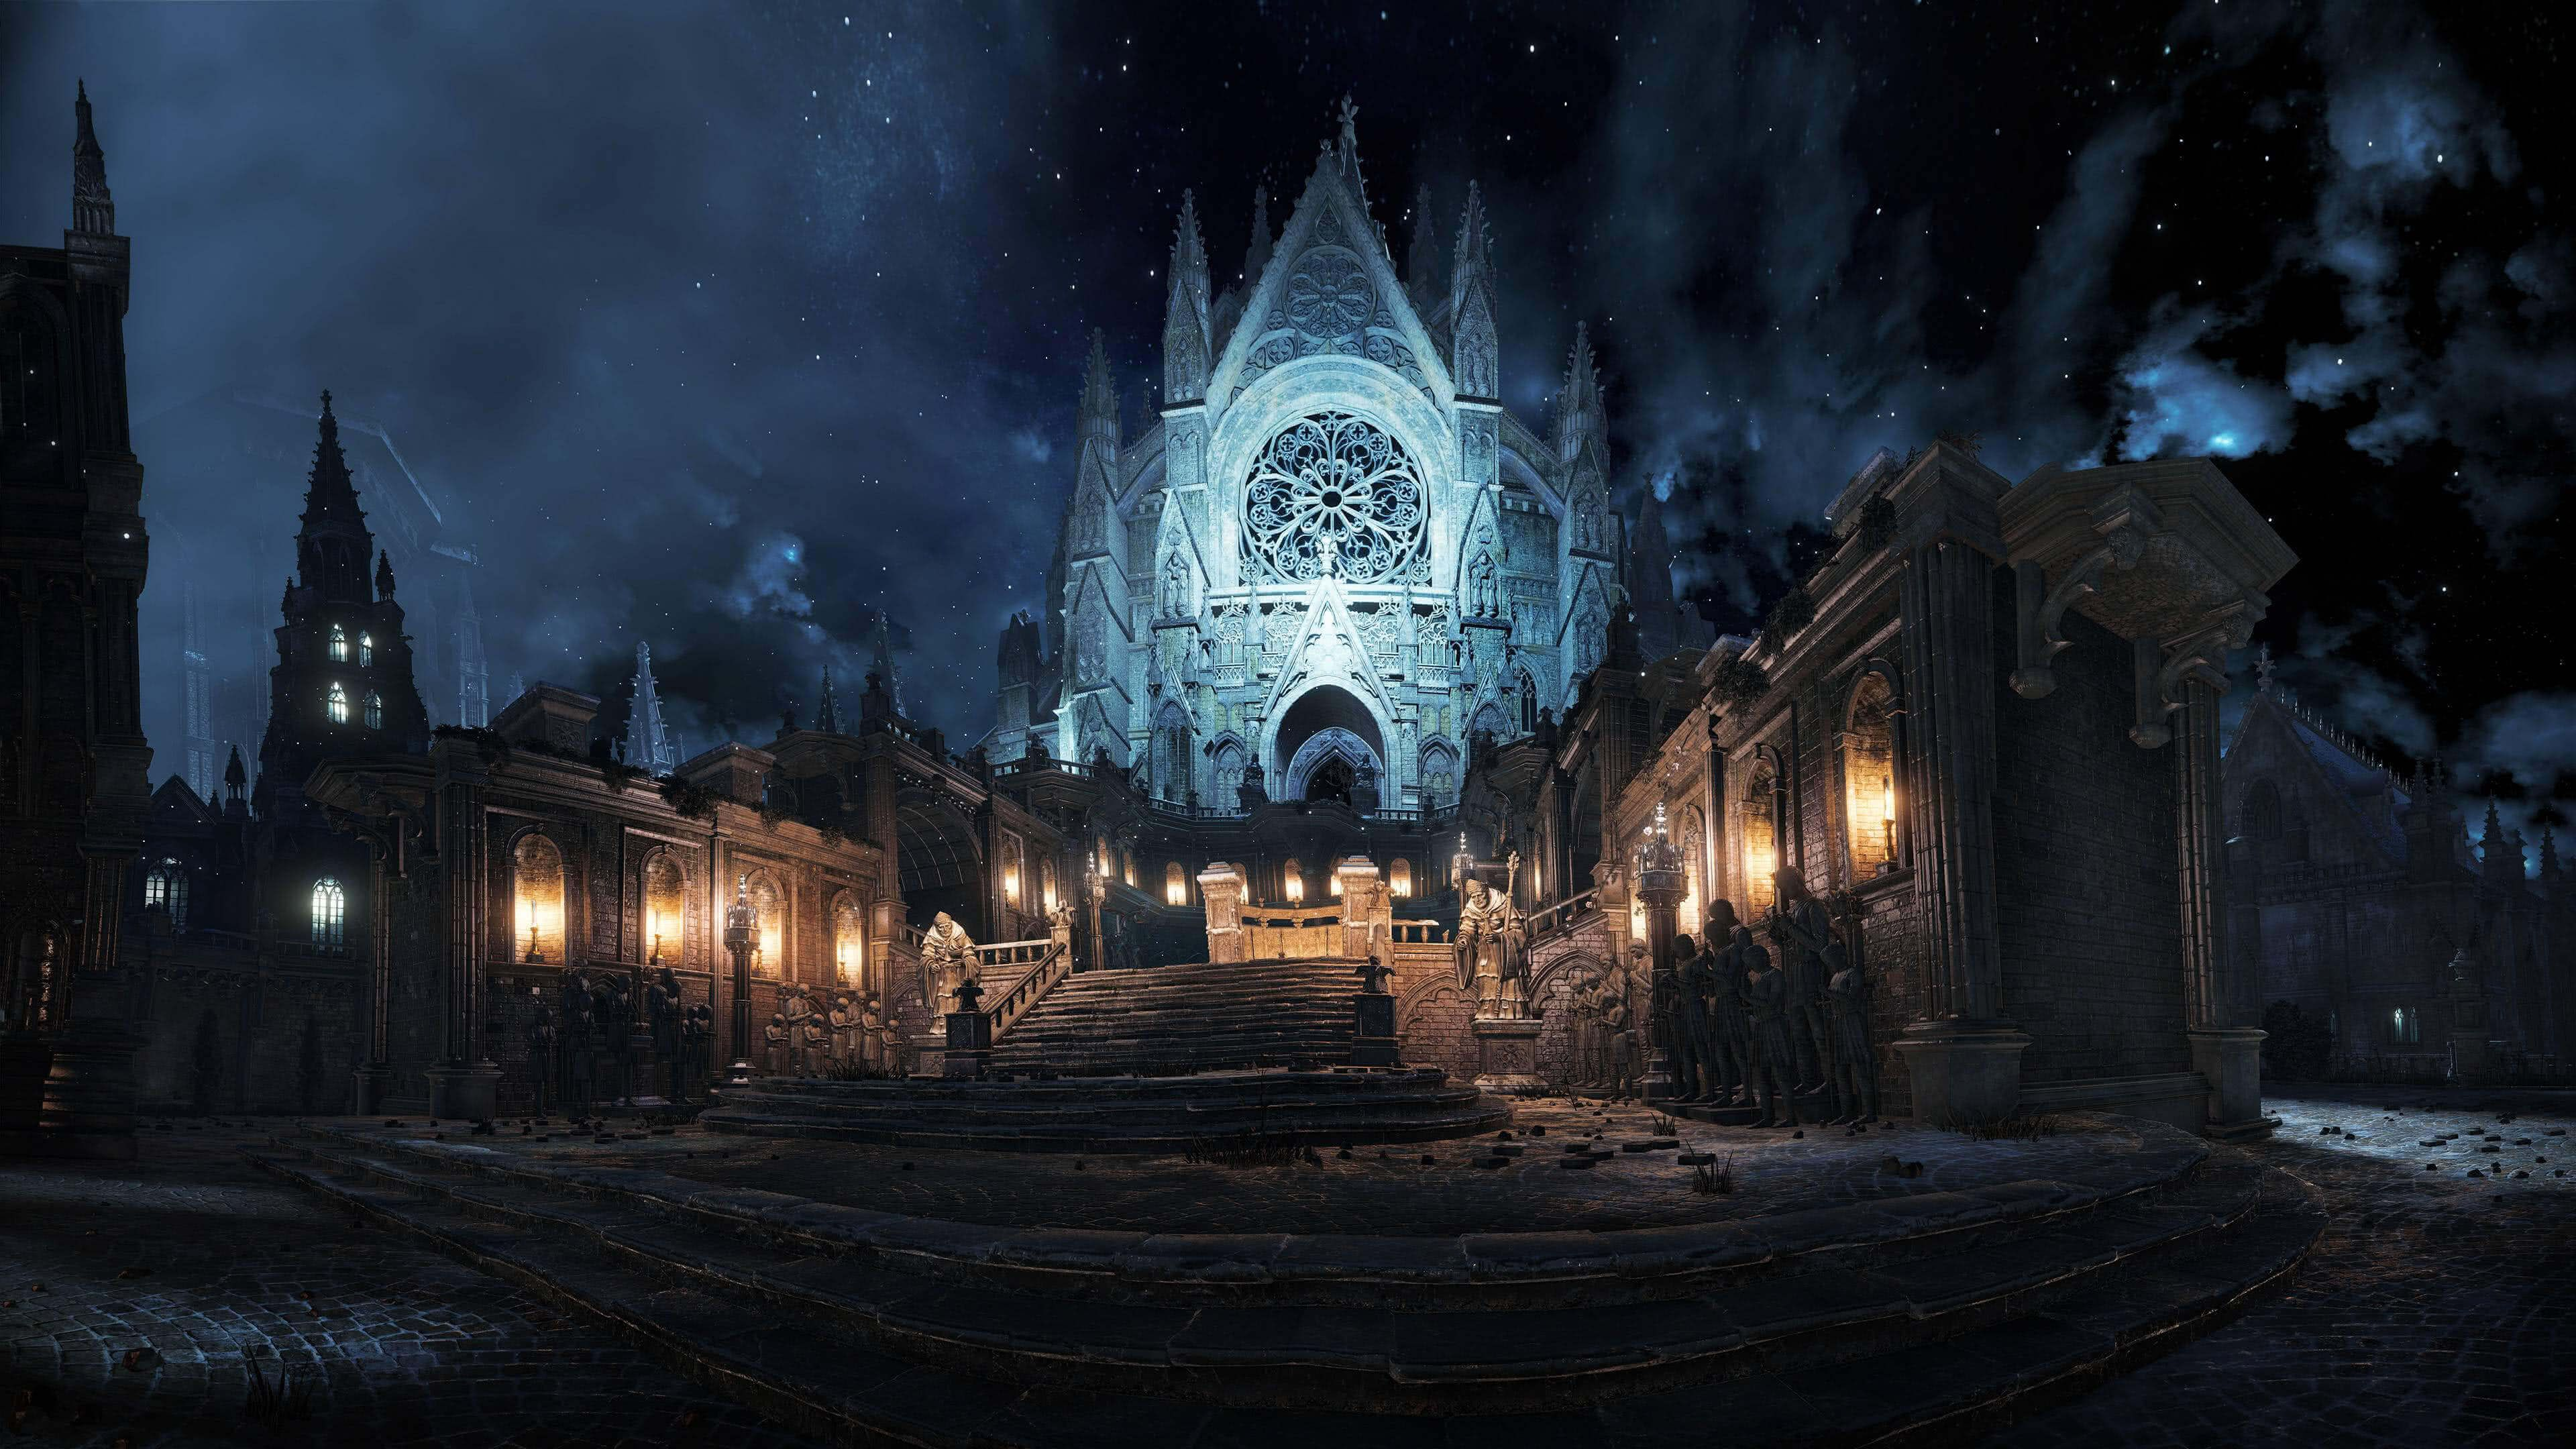 Dark Souls 3 Irithyll Of The Boreal Valley Uhd 4k Wallpaper Http Www Wallpaperback Net Games Dark Souls 3 Irithyll Borea Dark Souls Dark Souls 3 4k Wallpaper